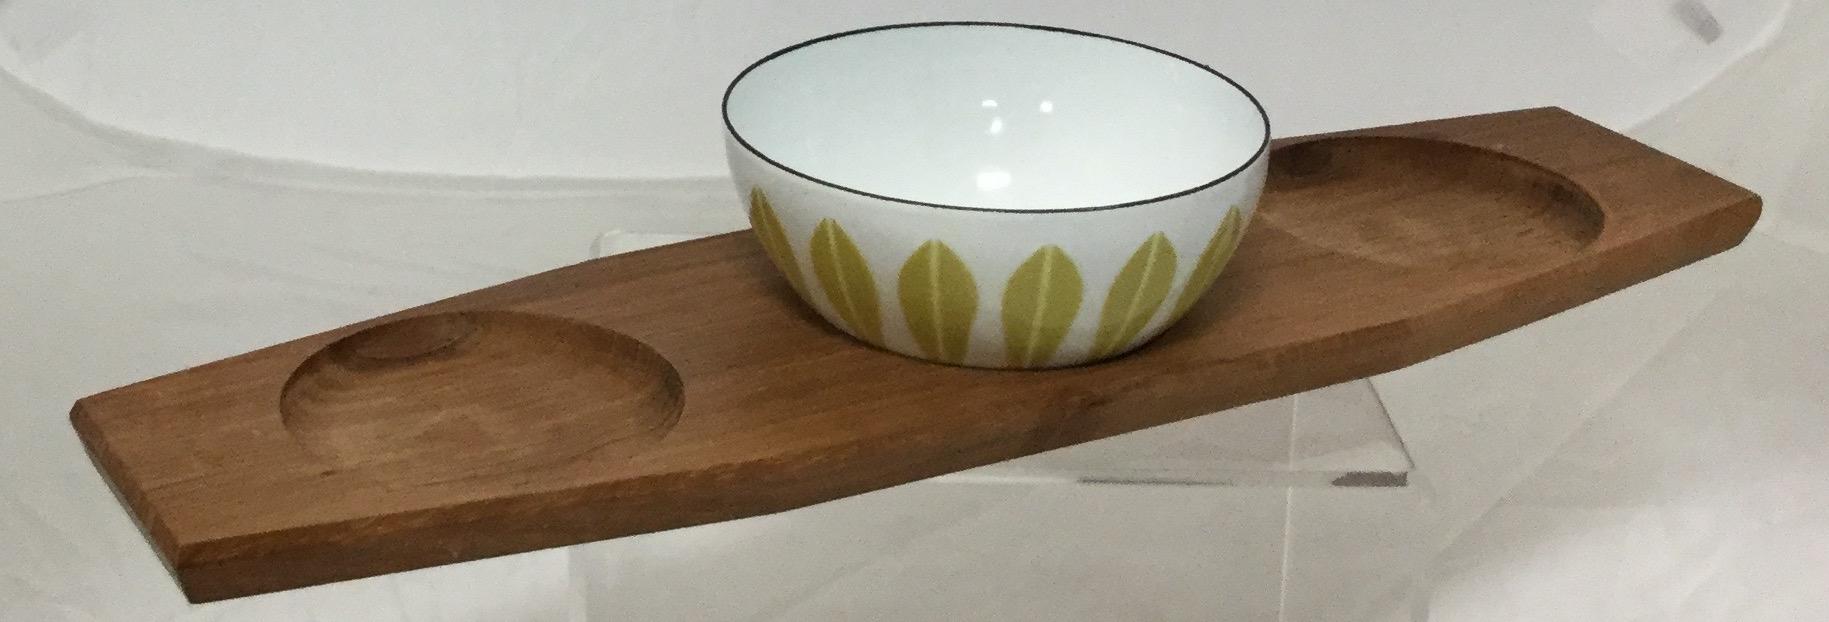 Three-Small-Enamel-Bowls-and-Tray_58255C.jpg